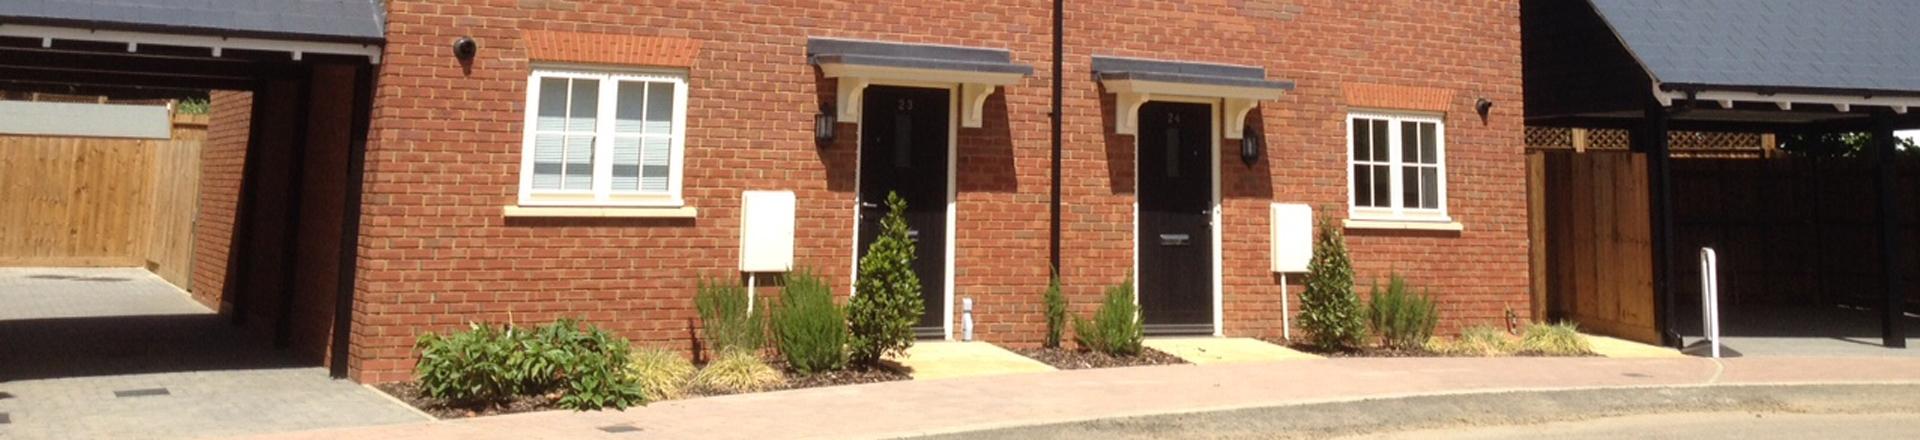 Bell Farm homes in Studham